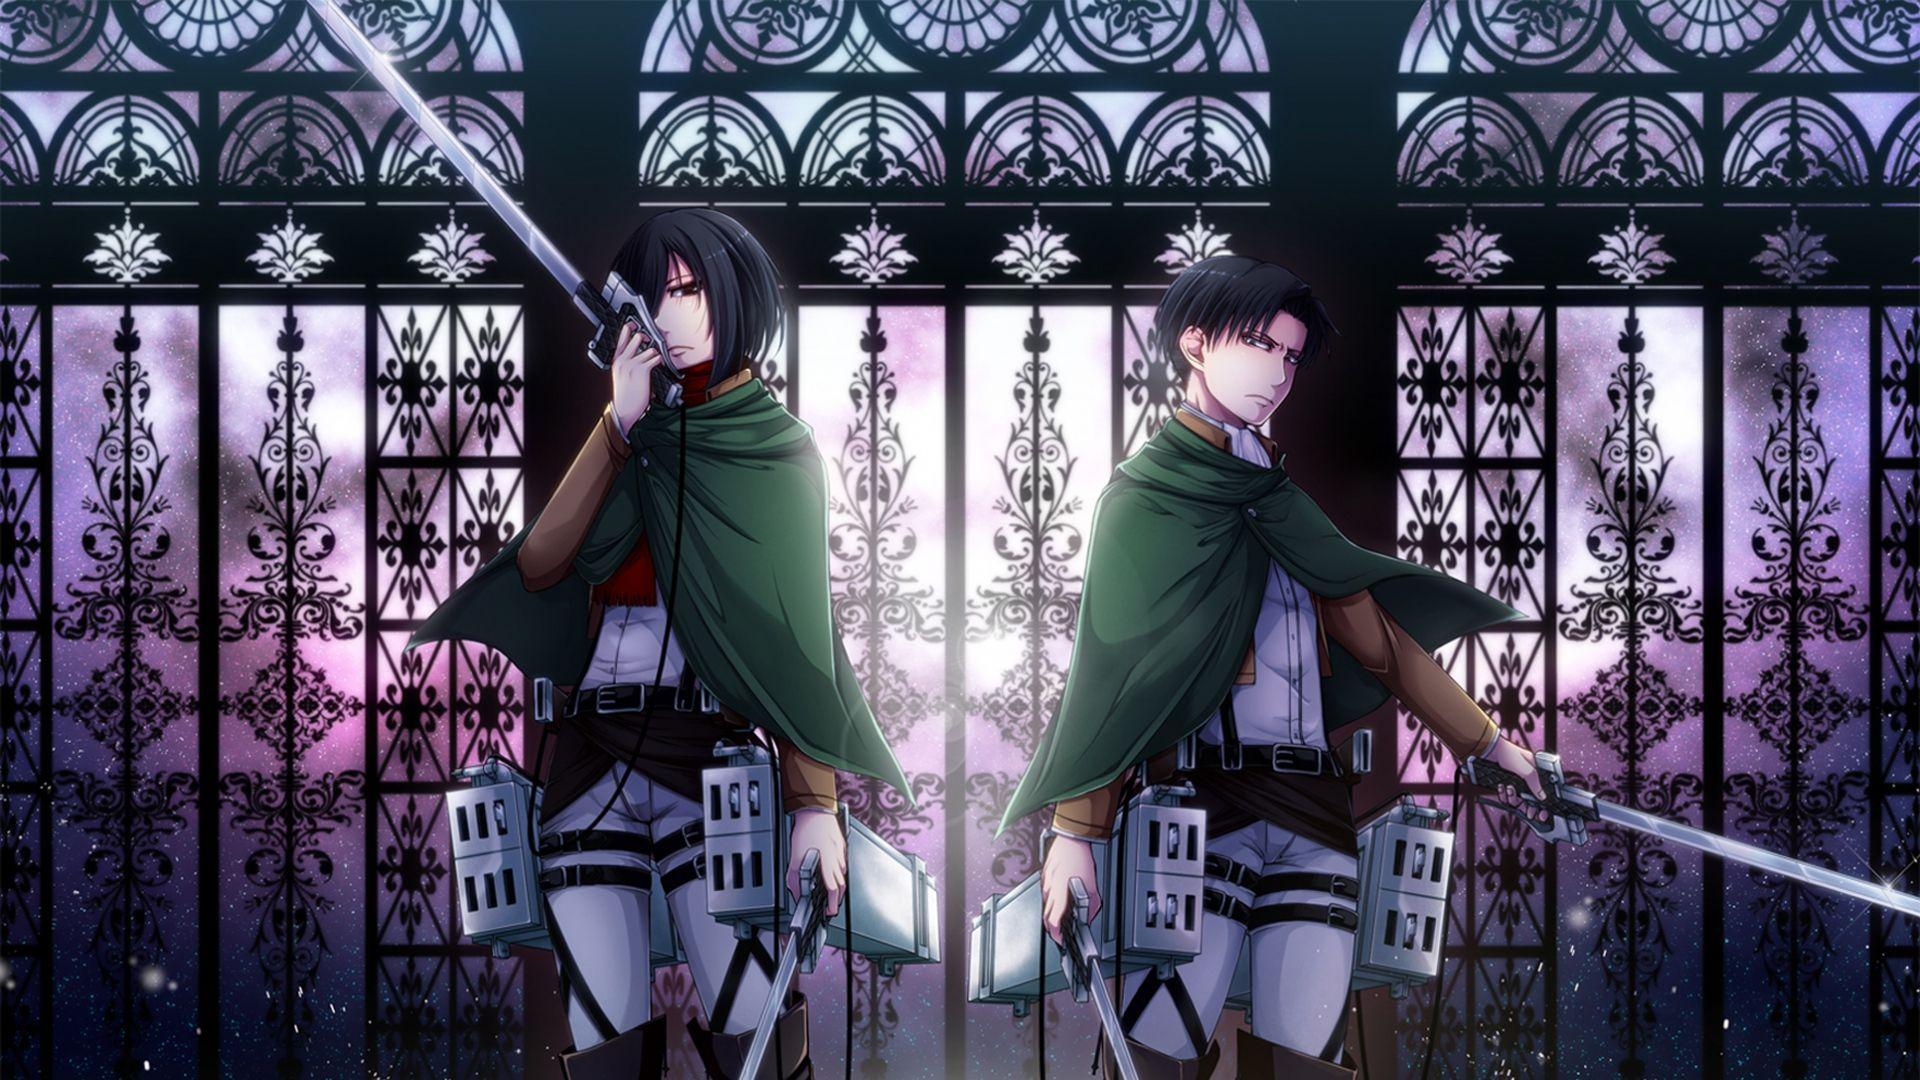 Anime Wallpaper Attack On Titan Levi And Mikasa